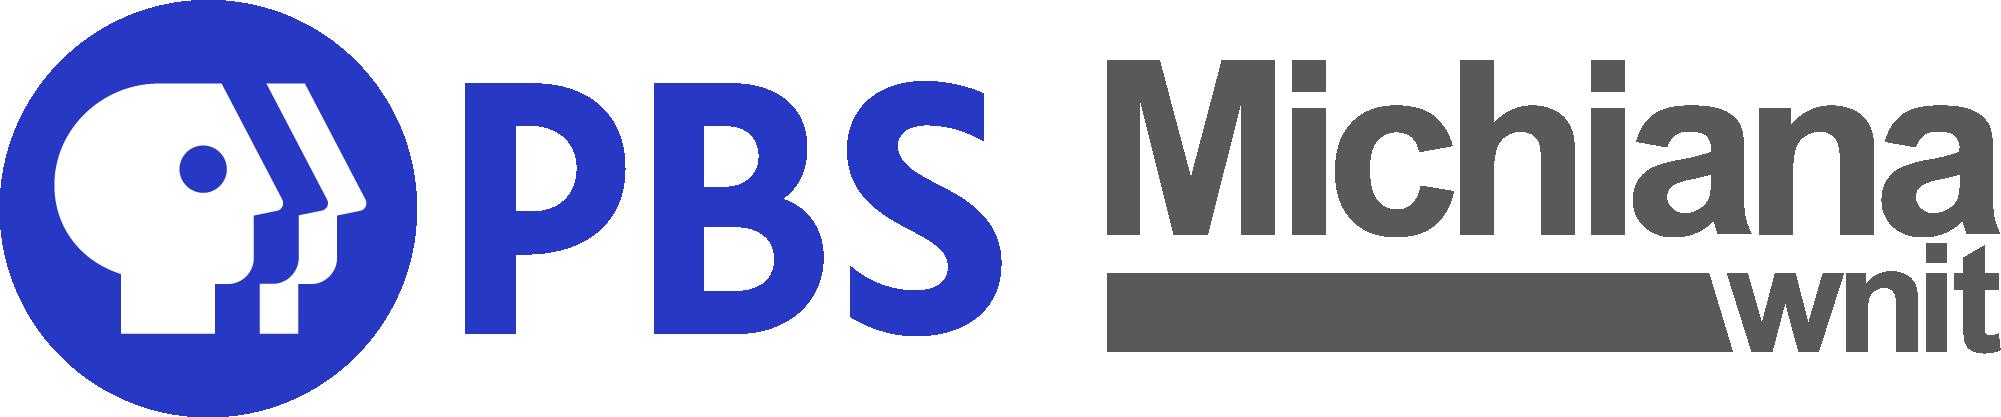 PBS Michiana